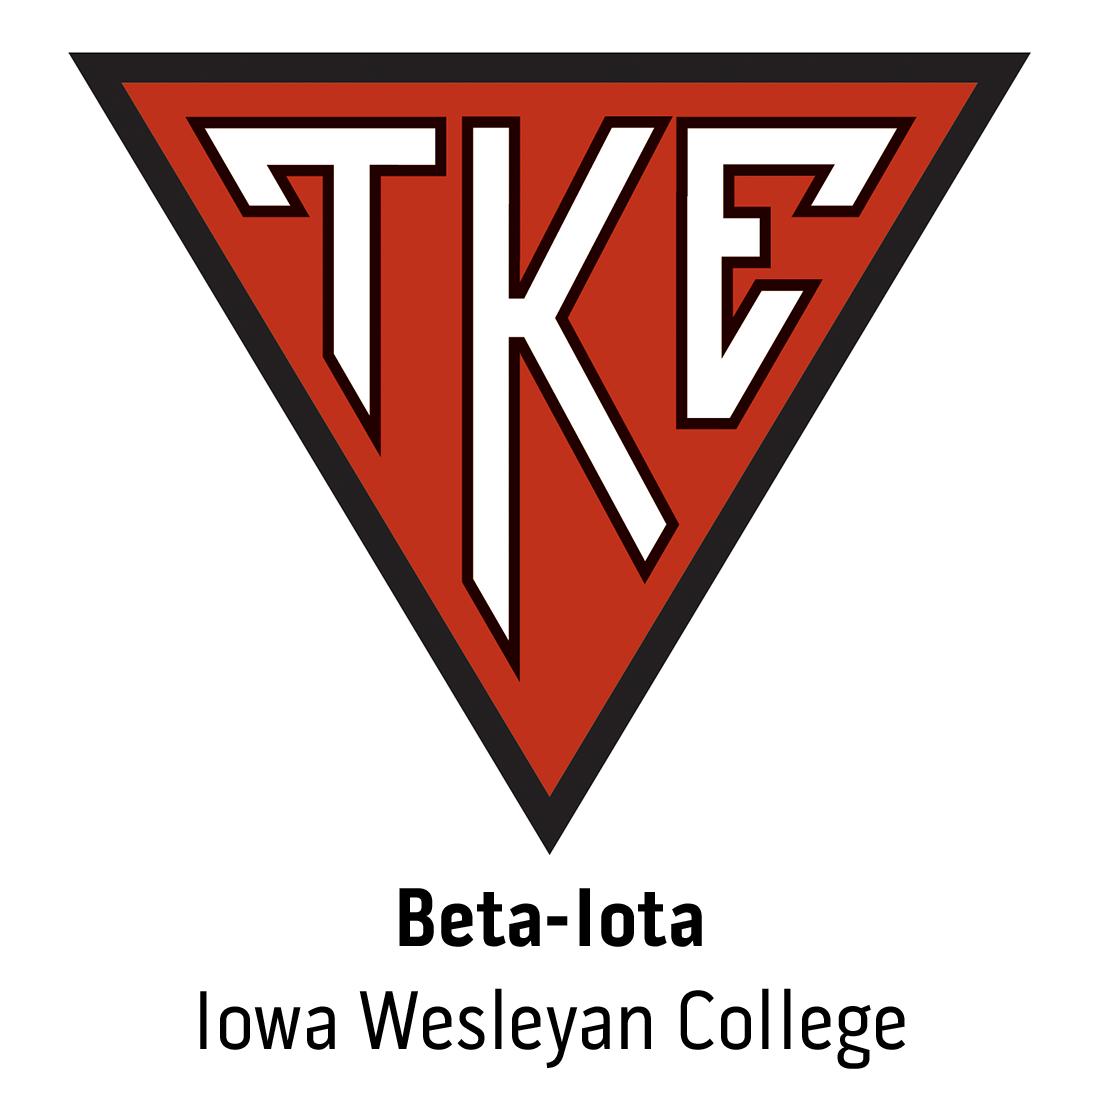 Beta-Iota Chapter at Iowa Wesleyan College